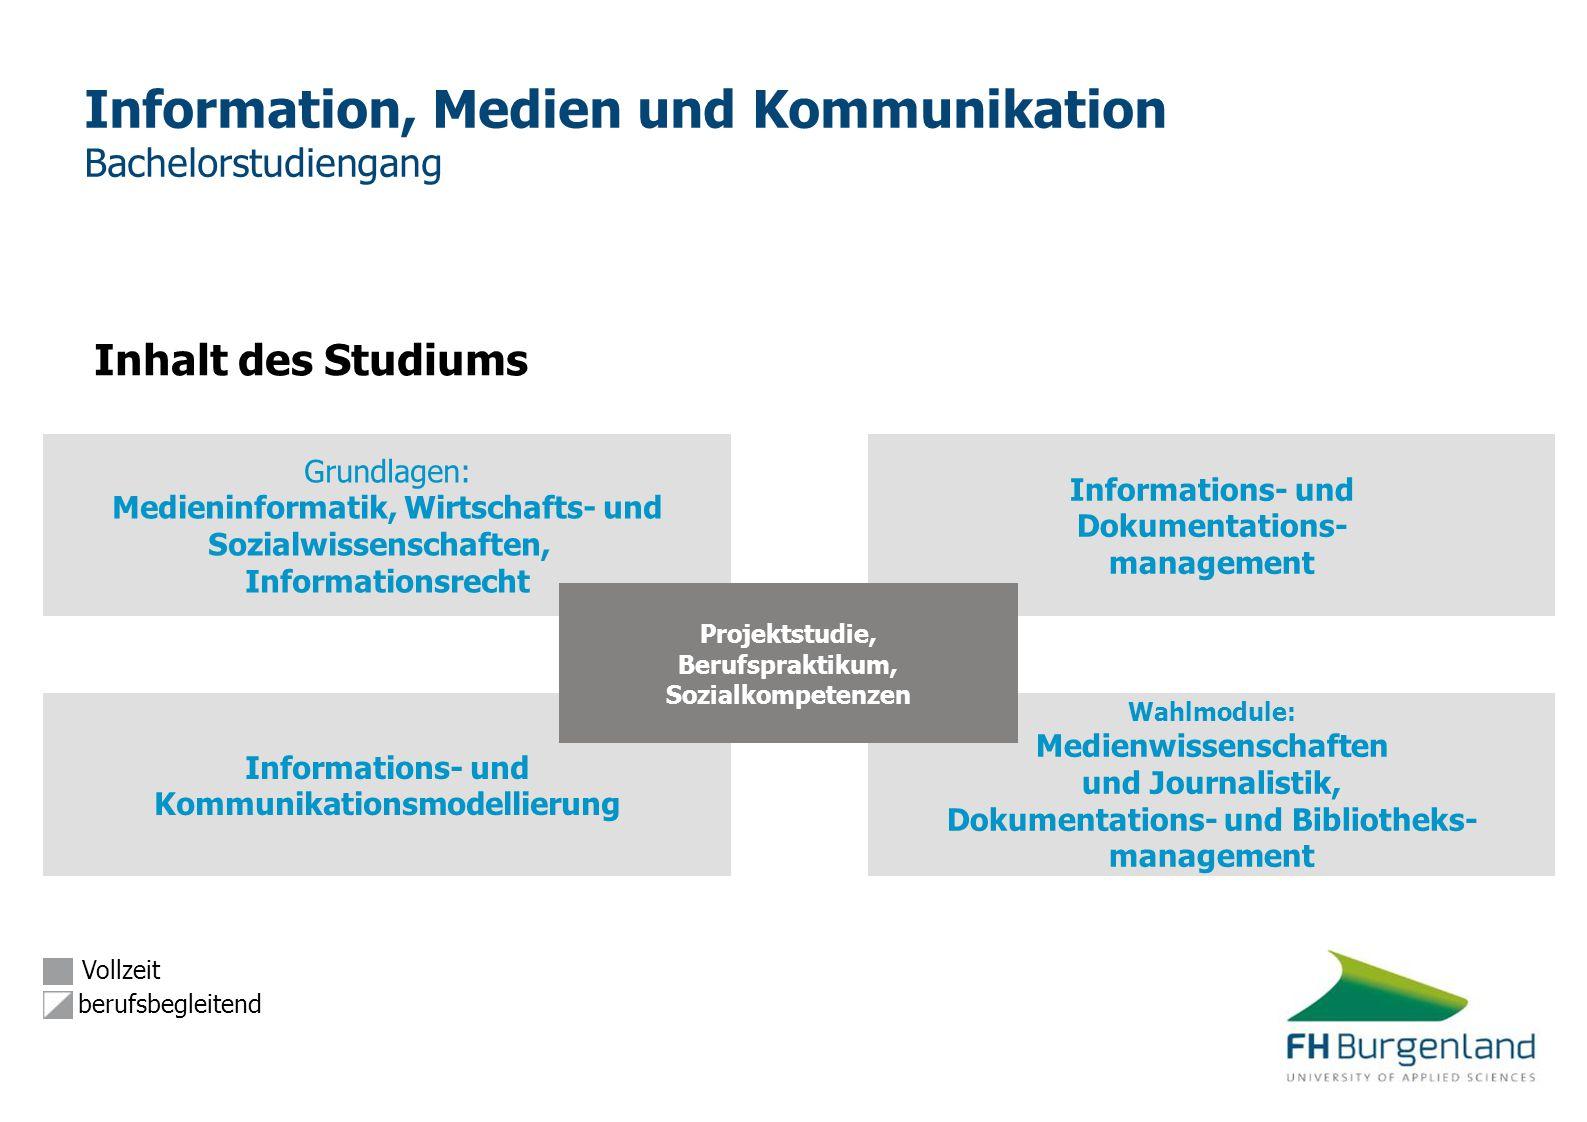 Information, Medien und Kommunikation Bachelorstudiengang